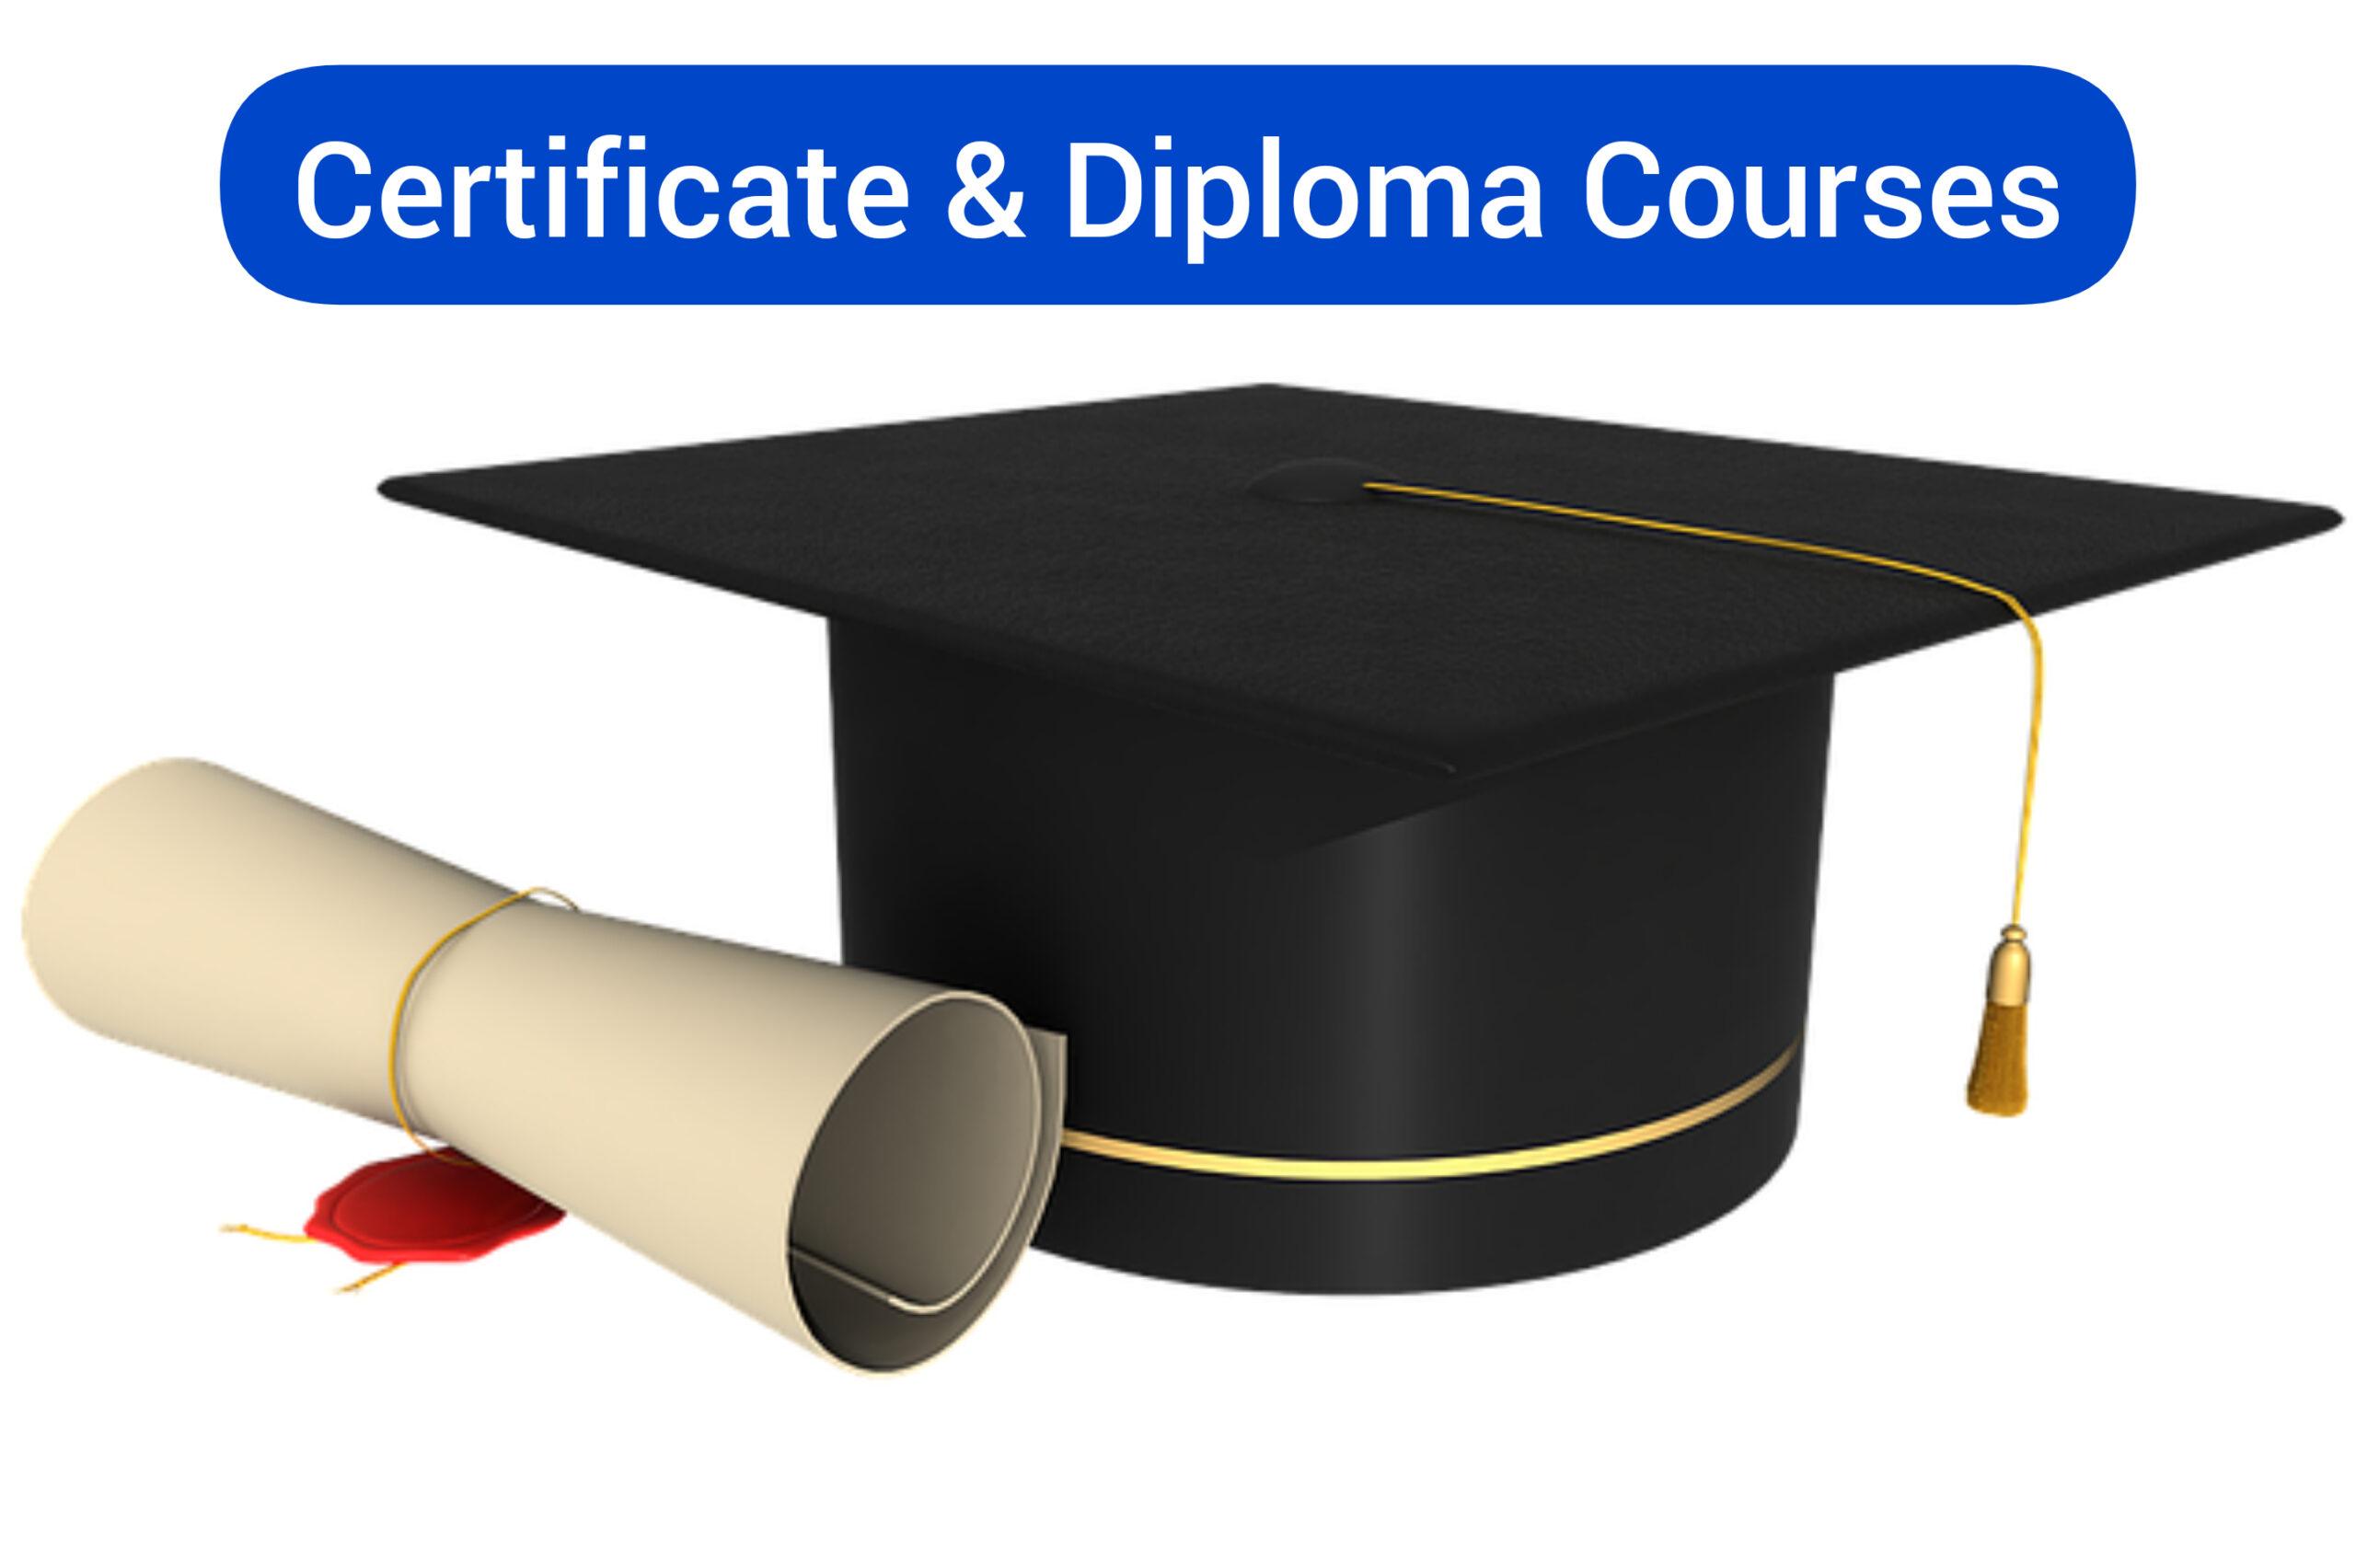 Certificate and Diploma Courses - kenyanmagazine.co.ke